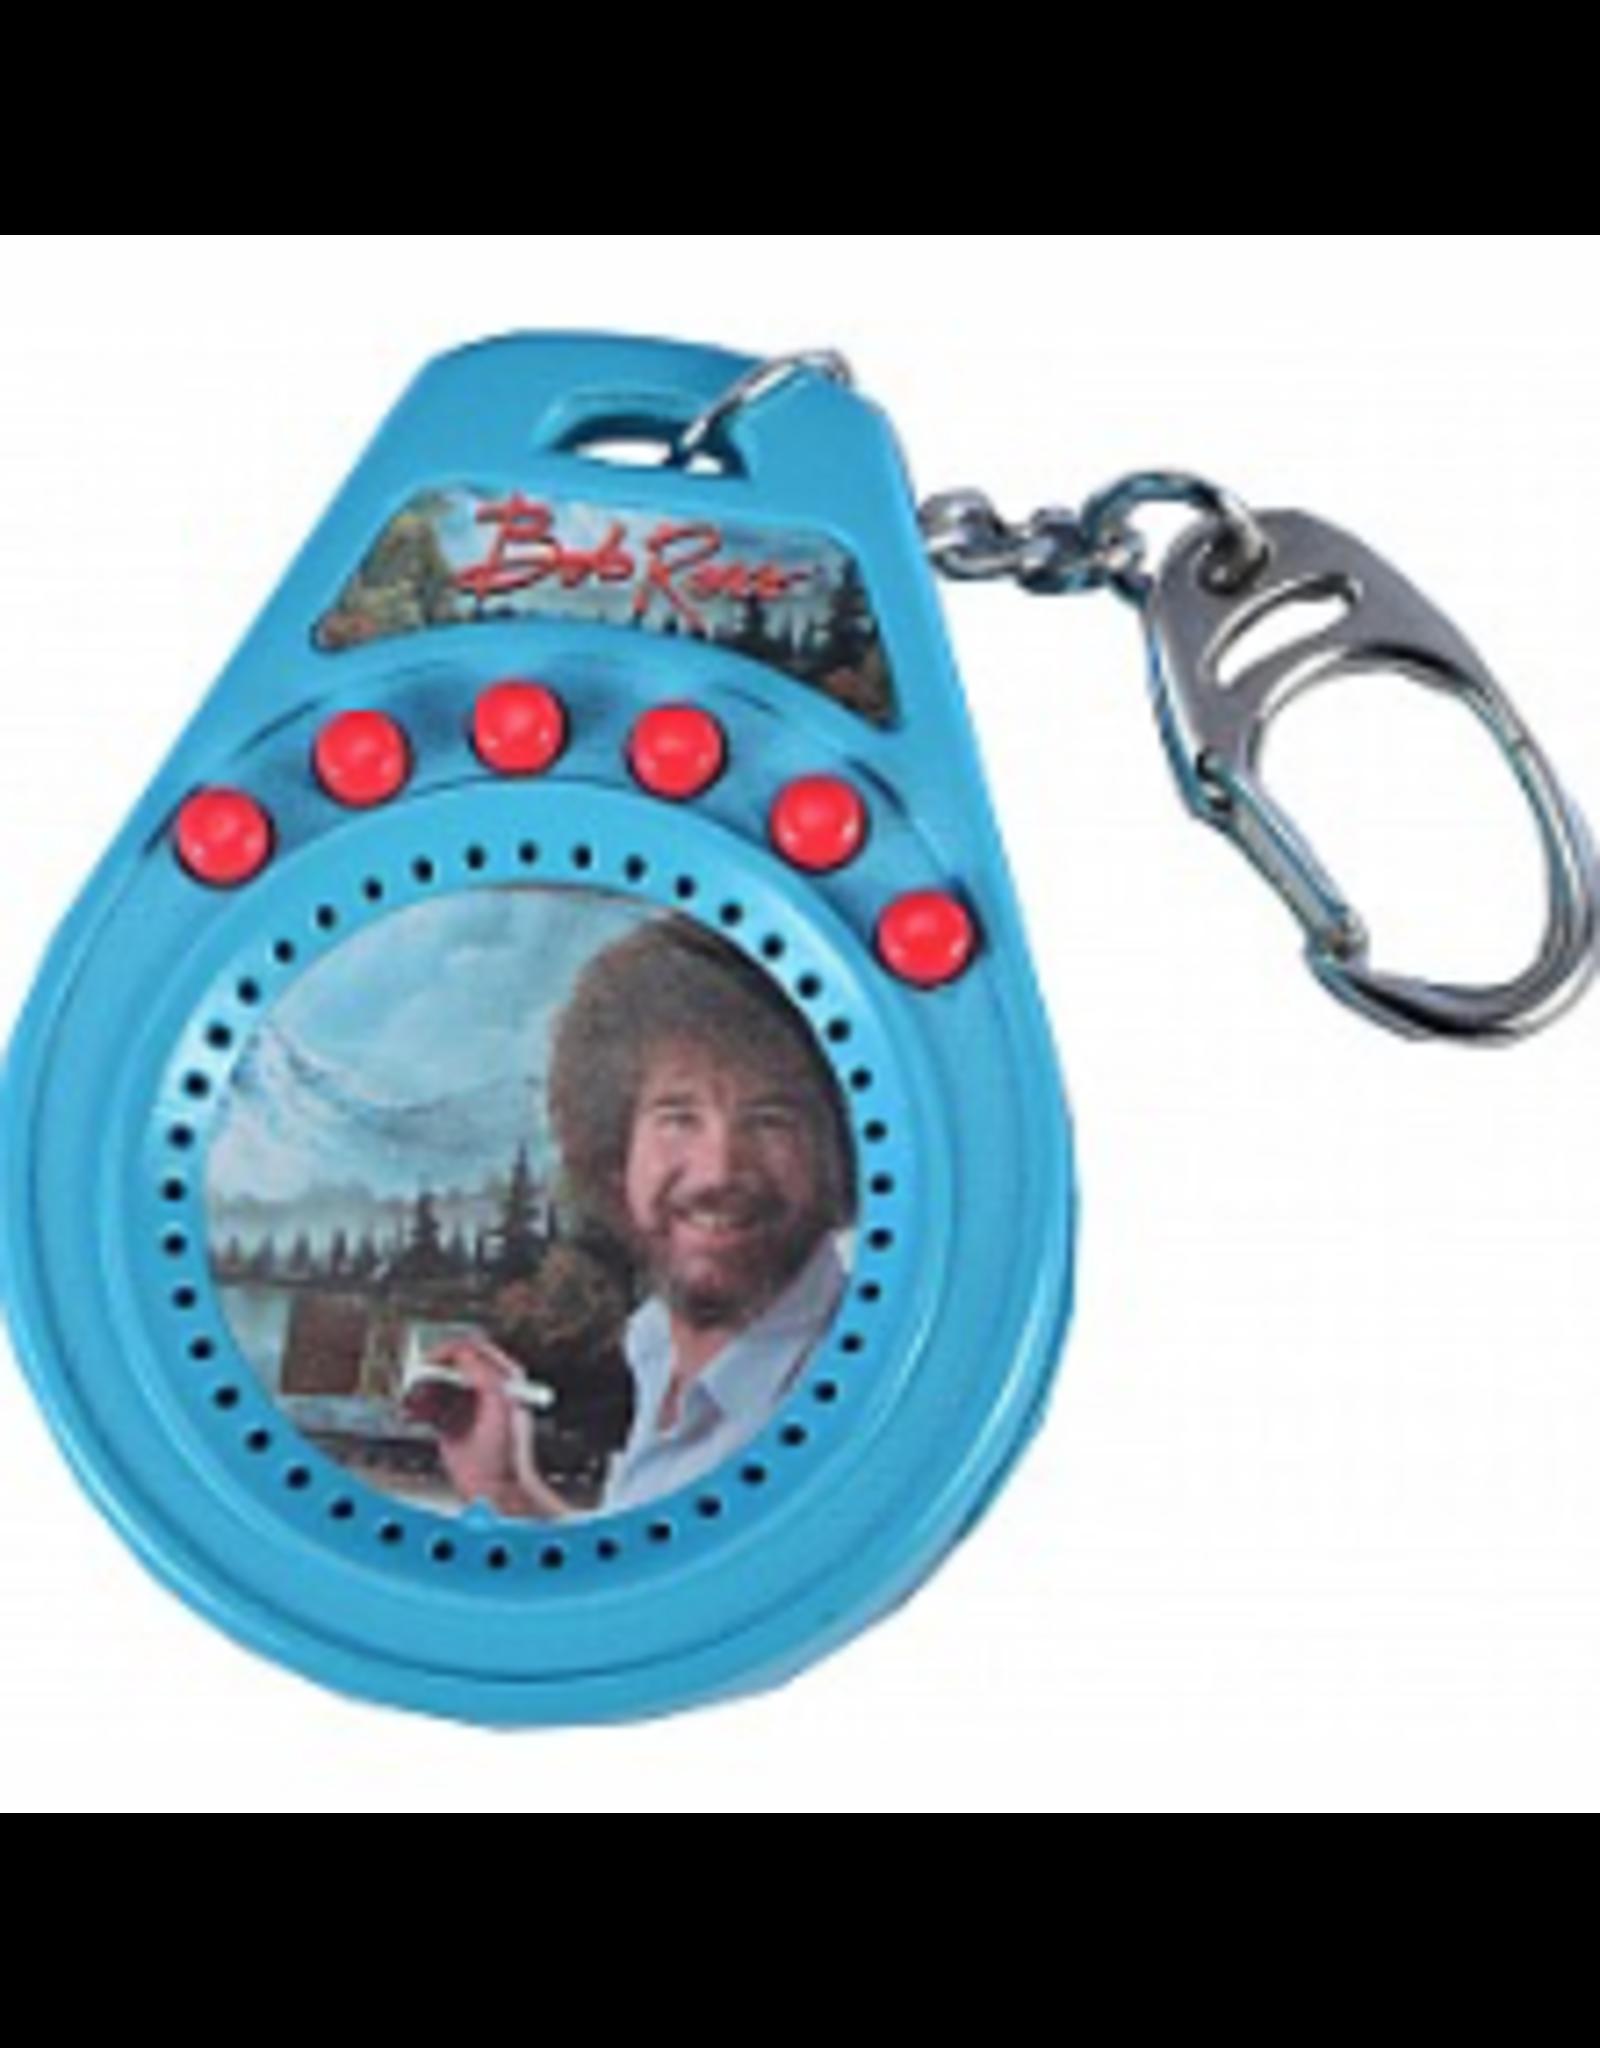 Super Impulse World's Coolest Bob Ross Talking Keychain